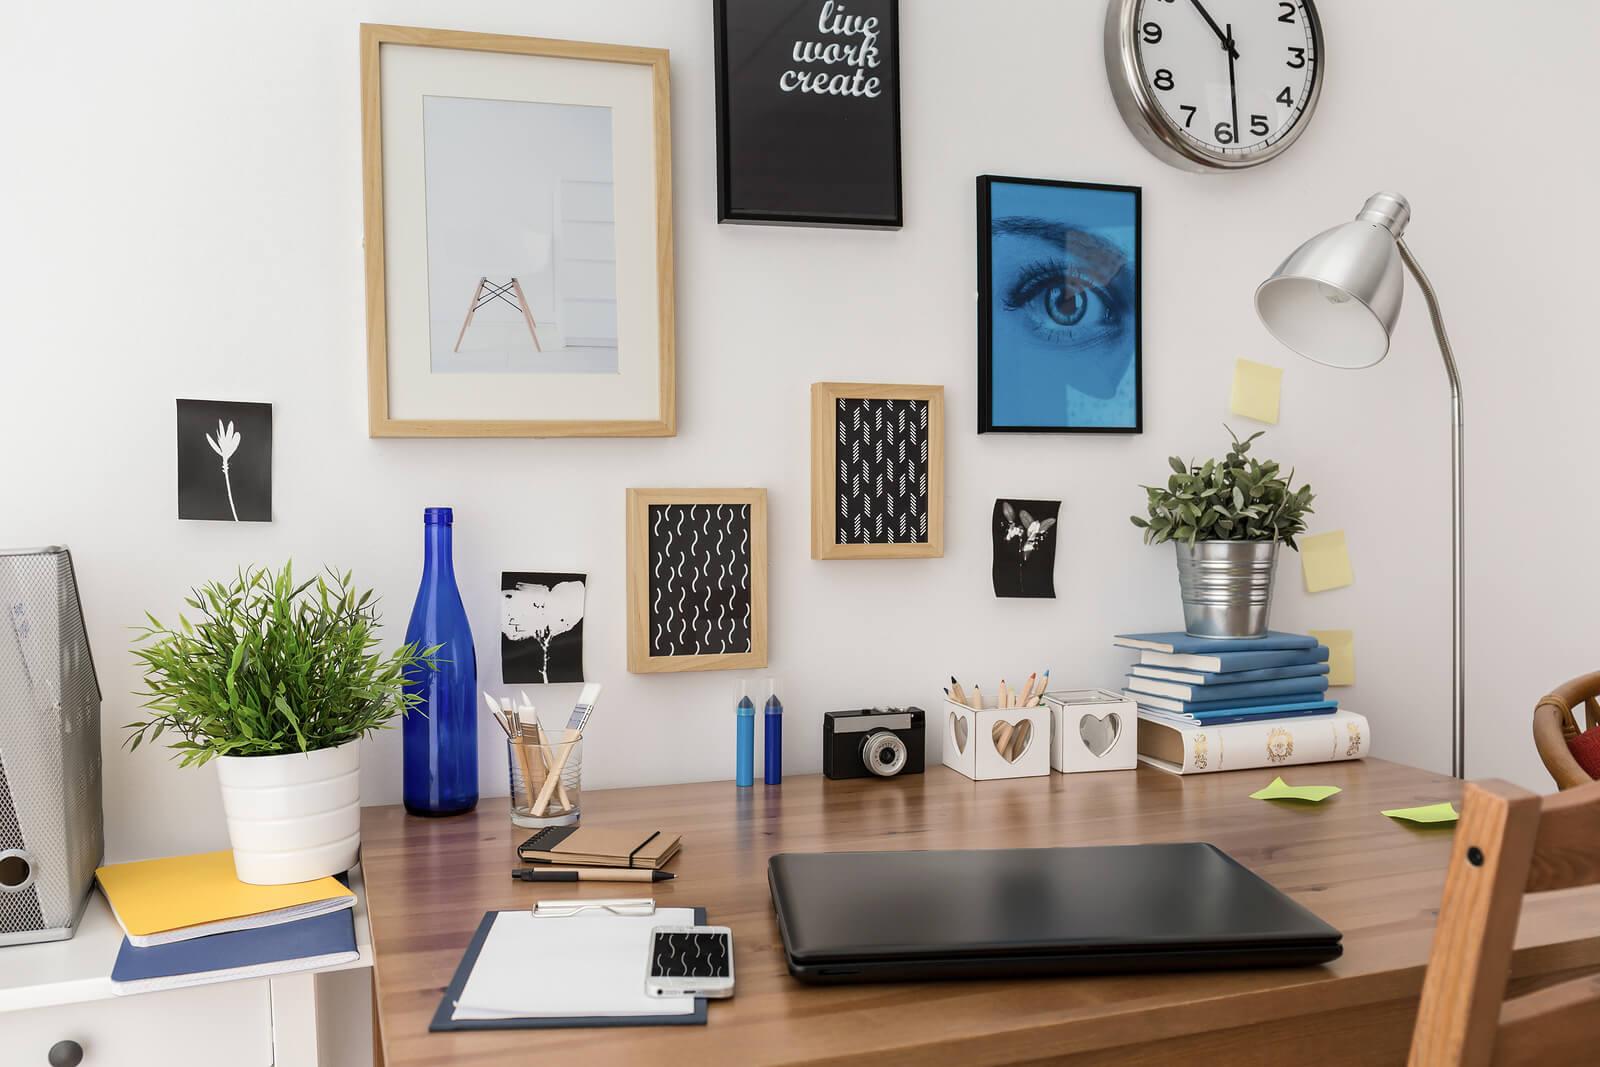 bigstock-Pictures-Above-Desk-93018317